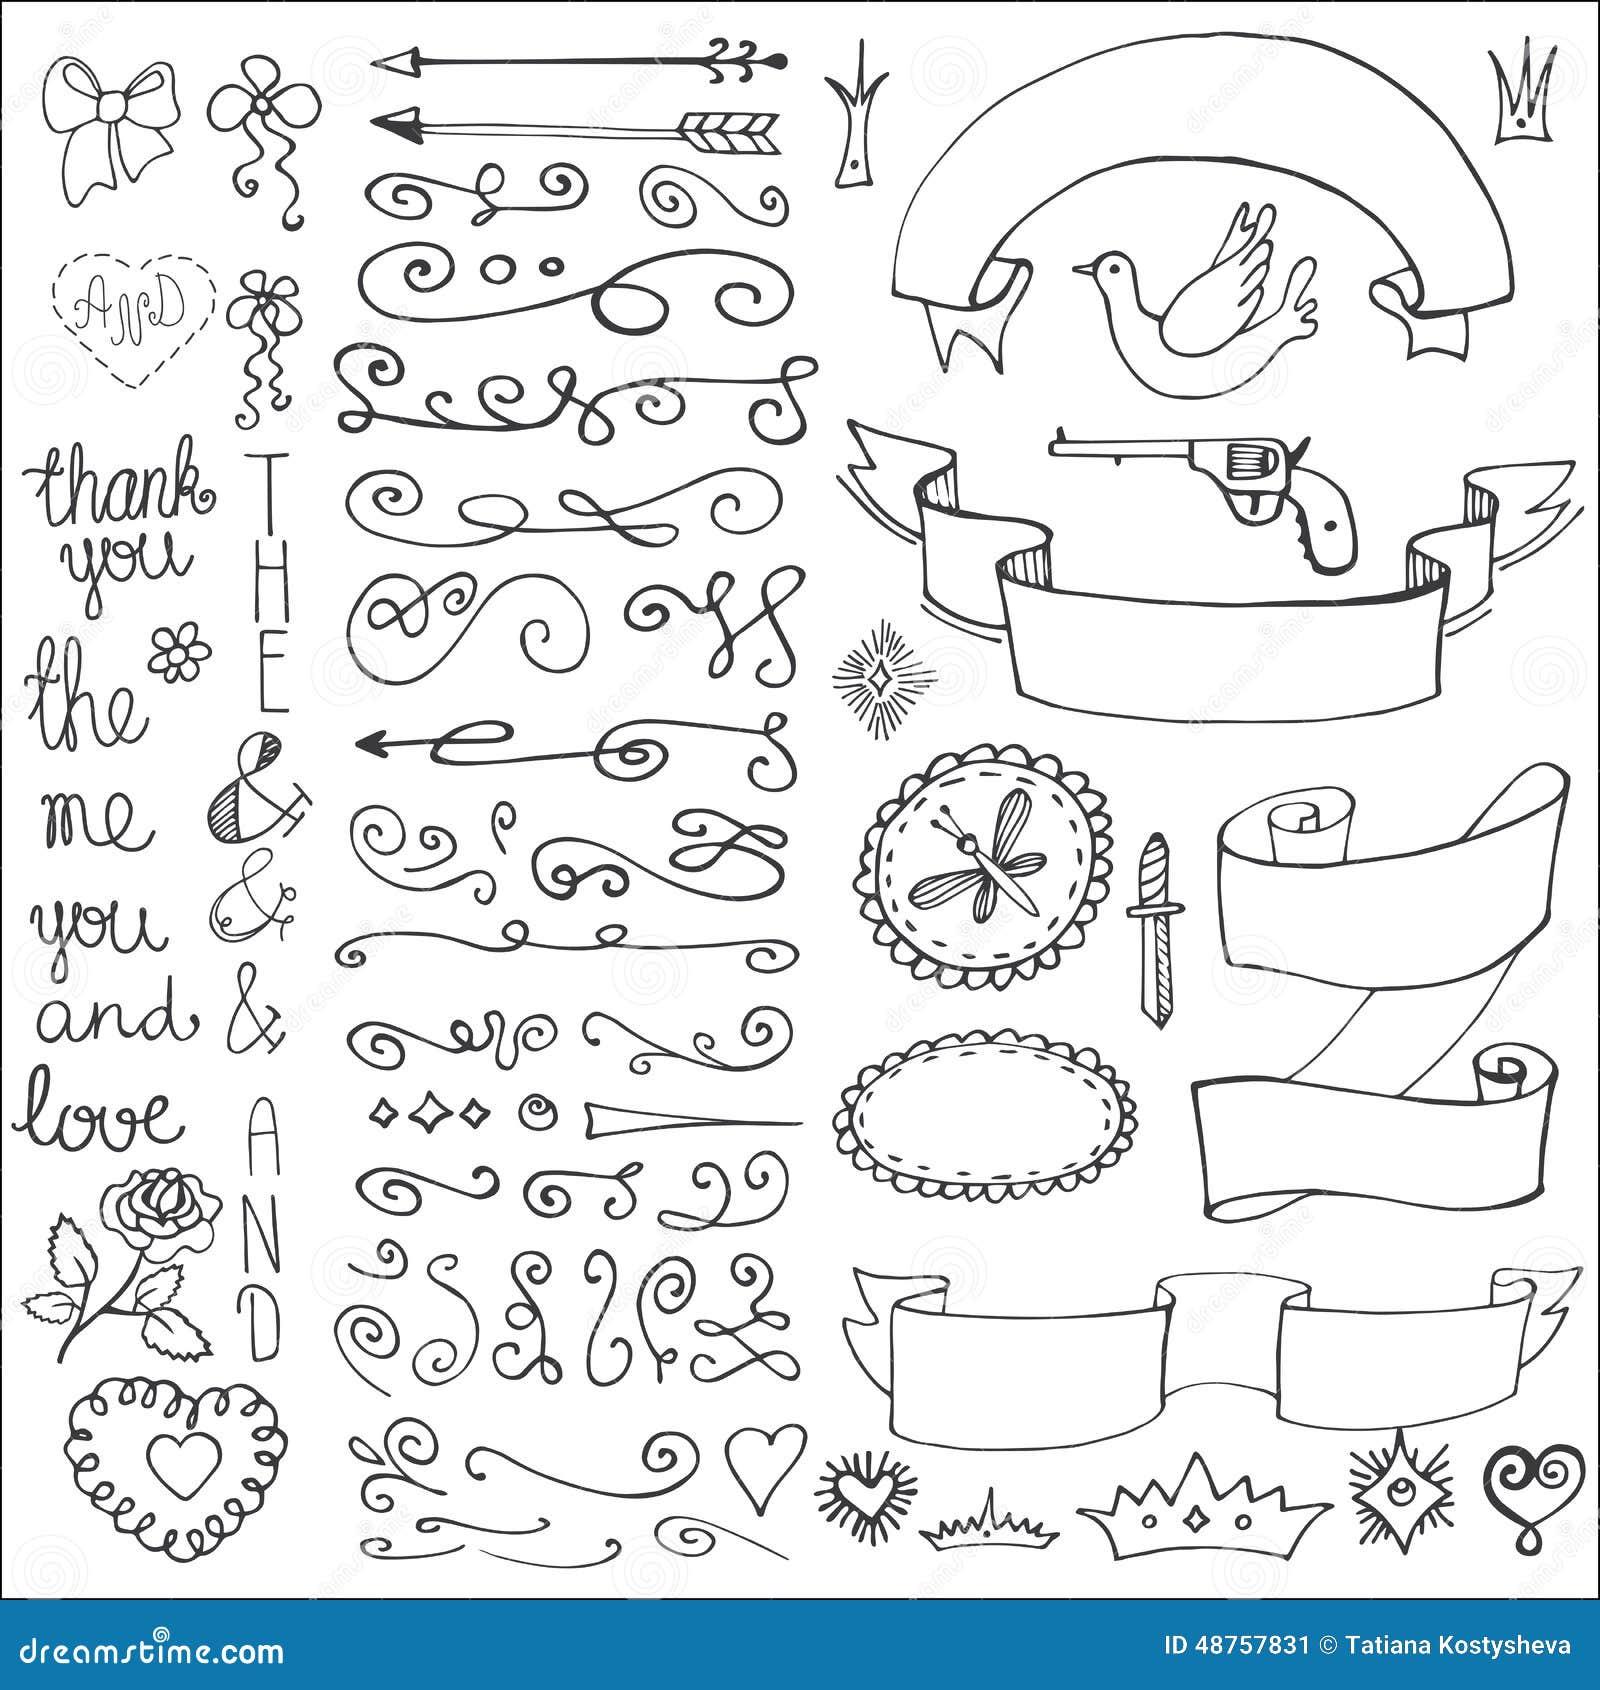 Doodles ribbons badges arrows decor element love stock for Dibujos para decorar